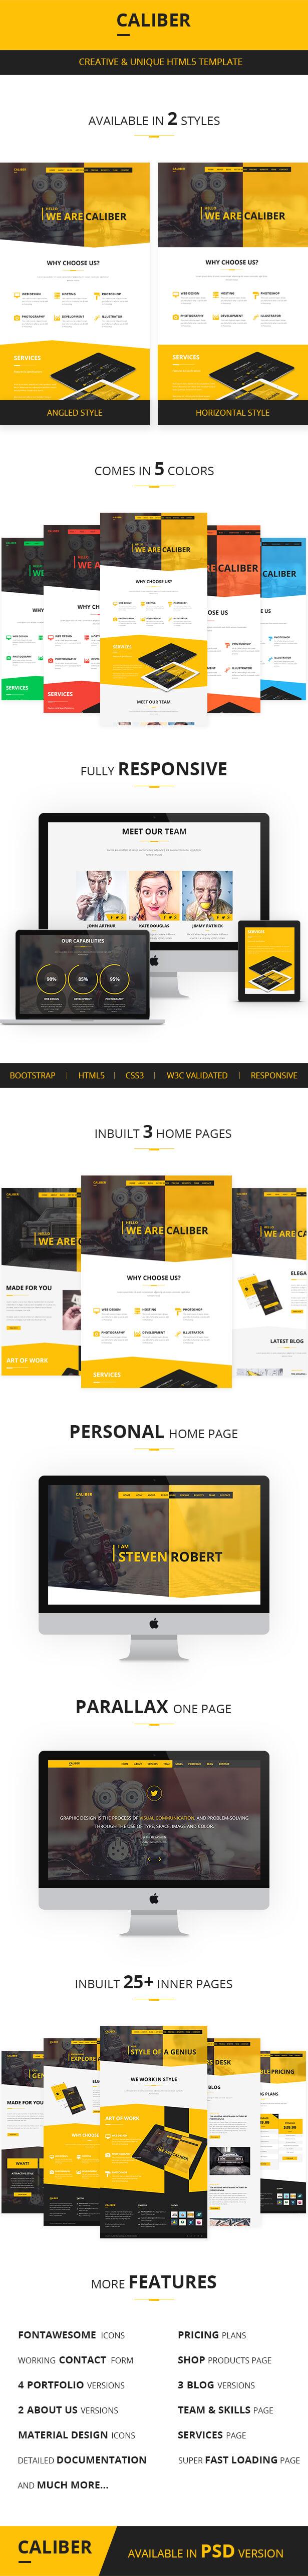 Caliber - Creative Multi Purpose HTML Template - 1